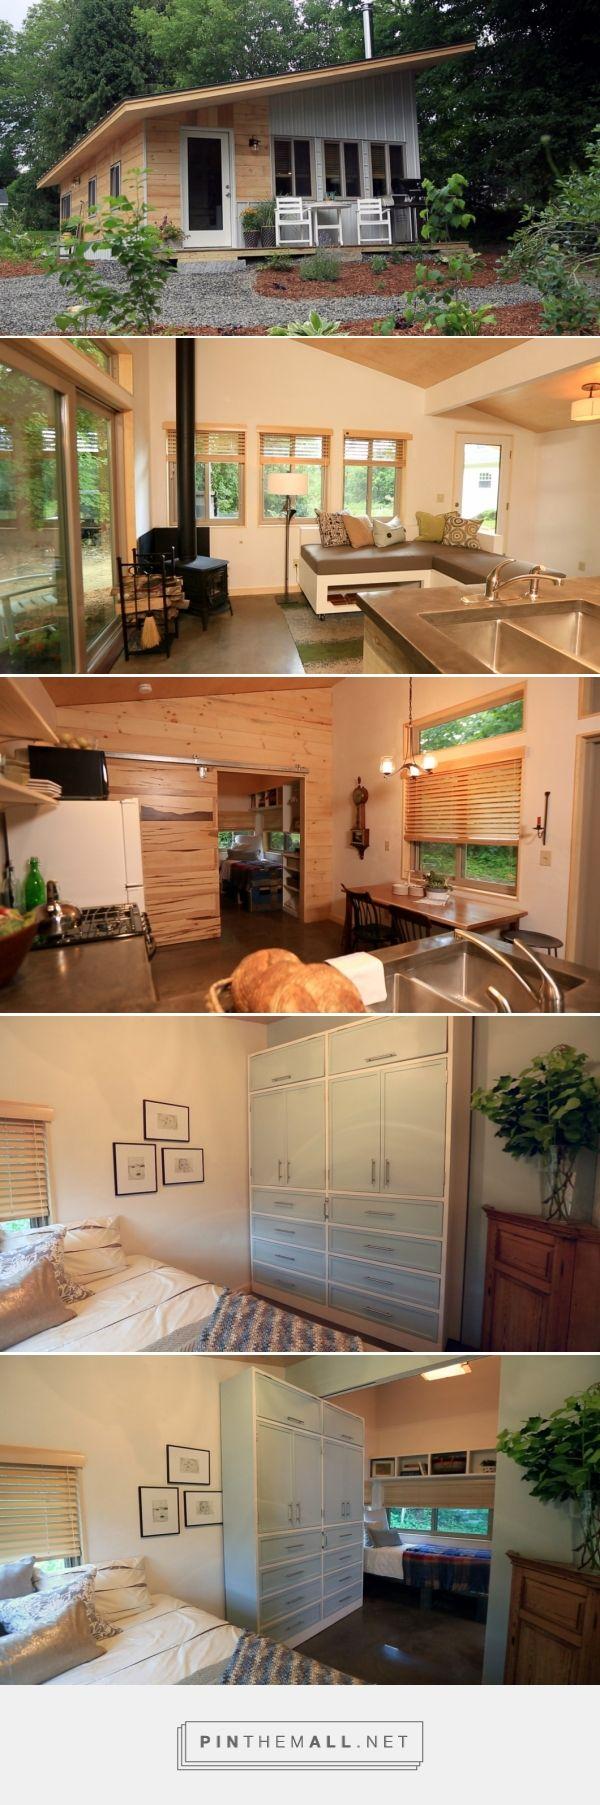 best 25+ tiny house nation ideas on pinterest | tiny homes, mini